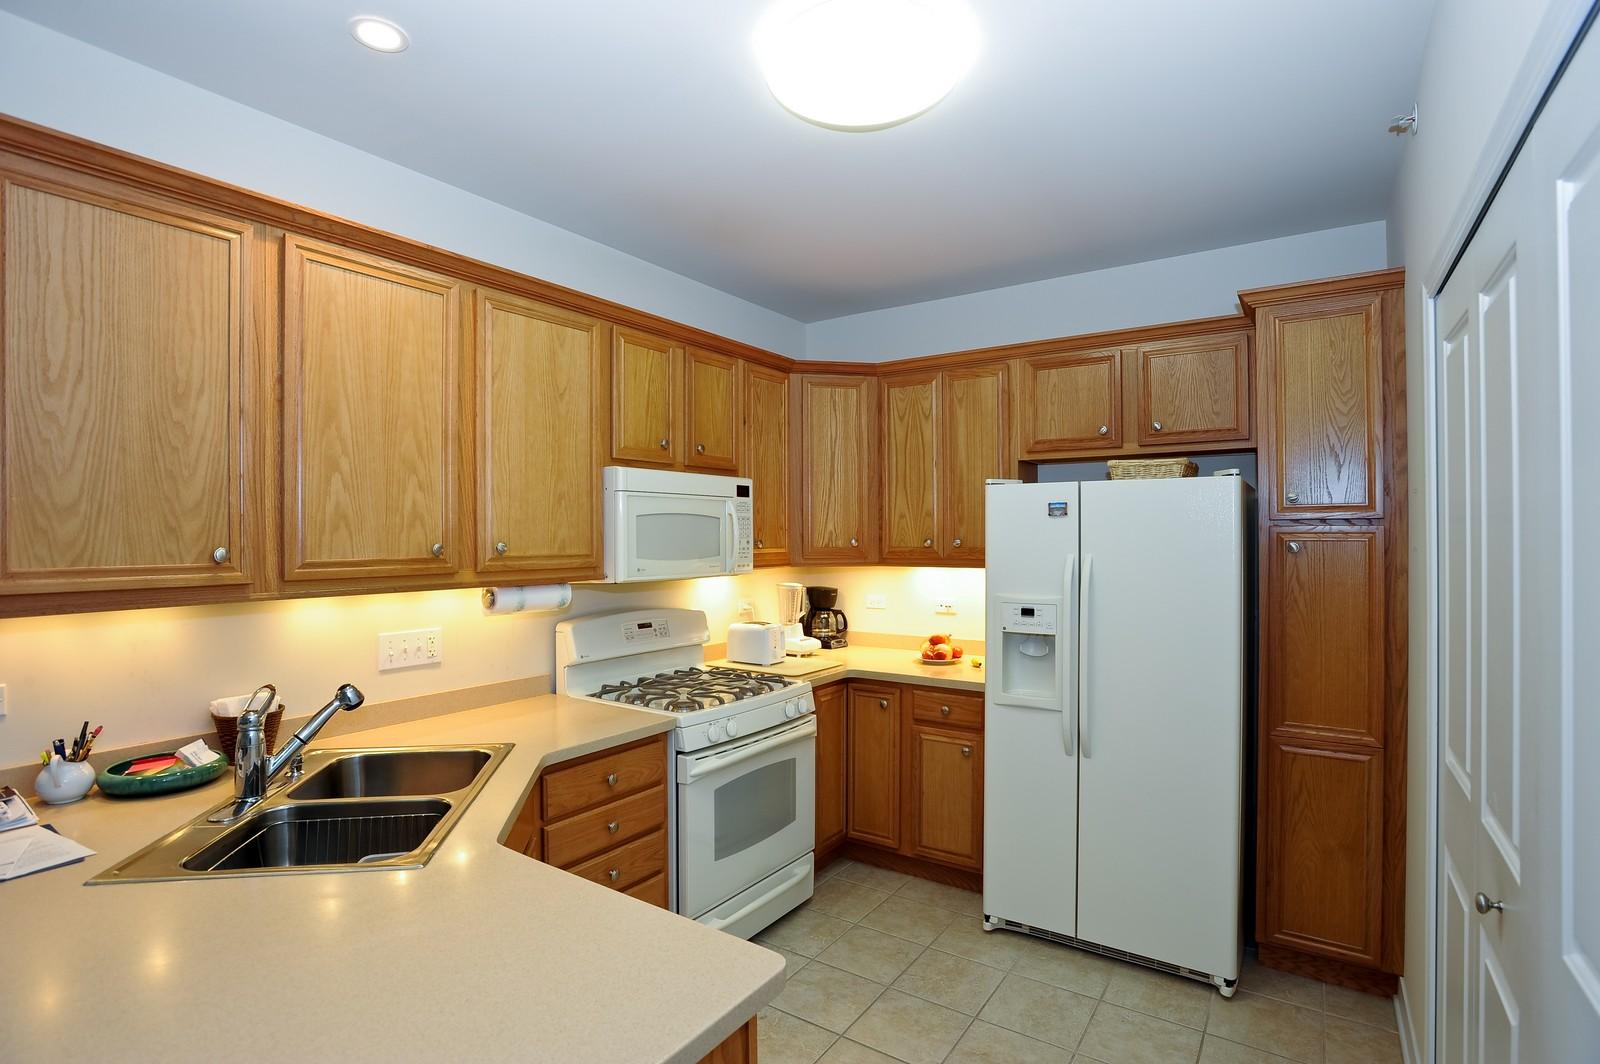 Real Estate Photography - 2692 Stone Circle, 209, Geneva, IL, 60134 - Kitchen